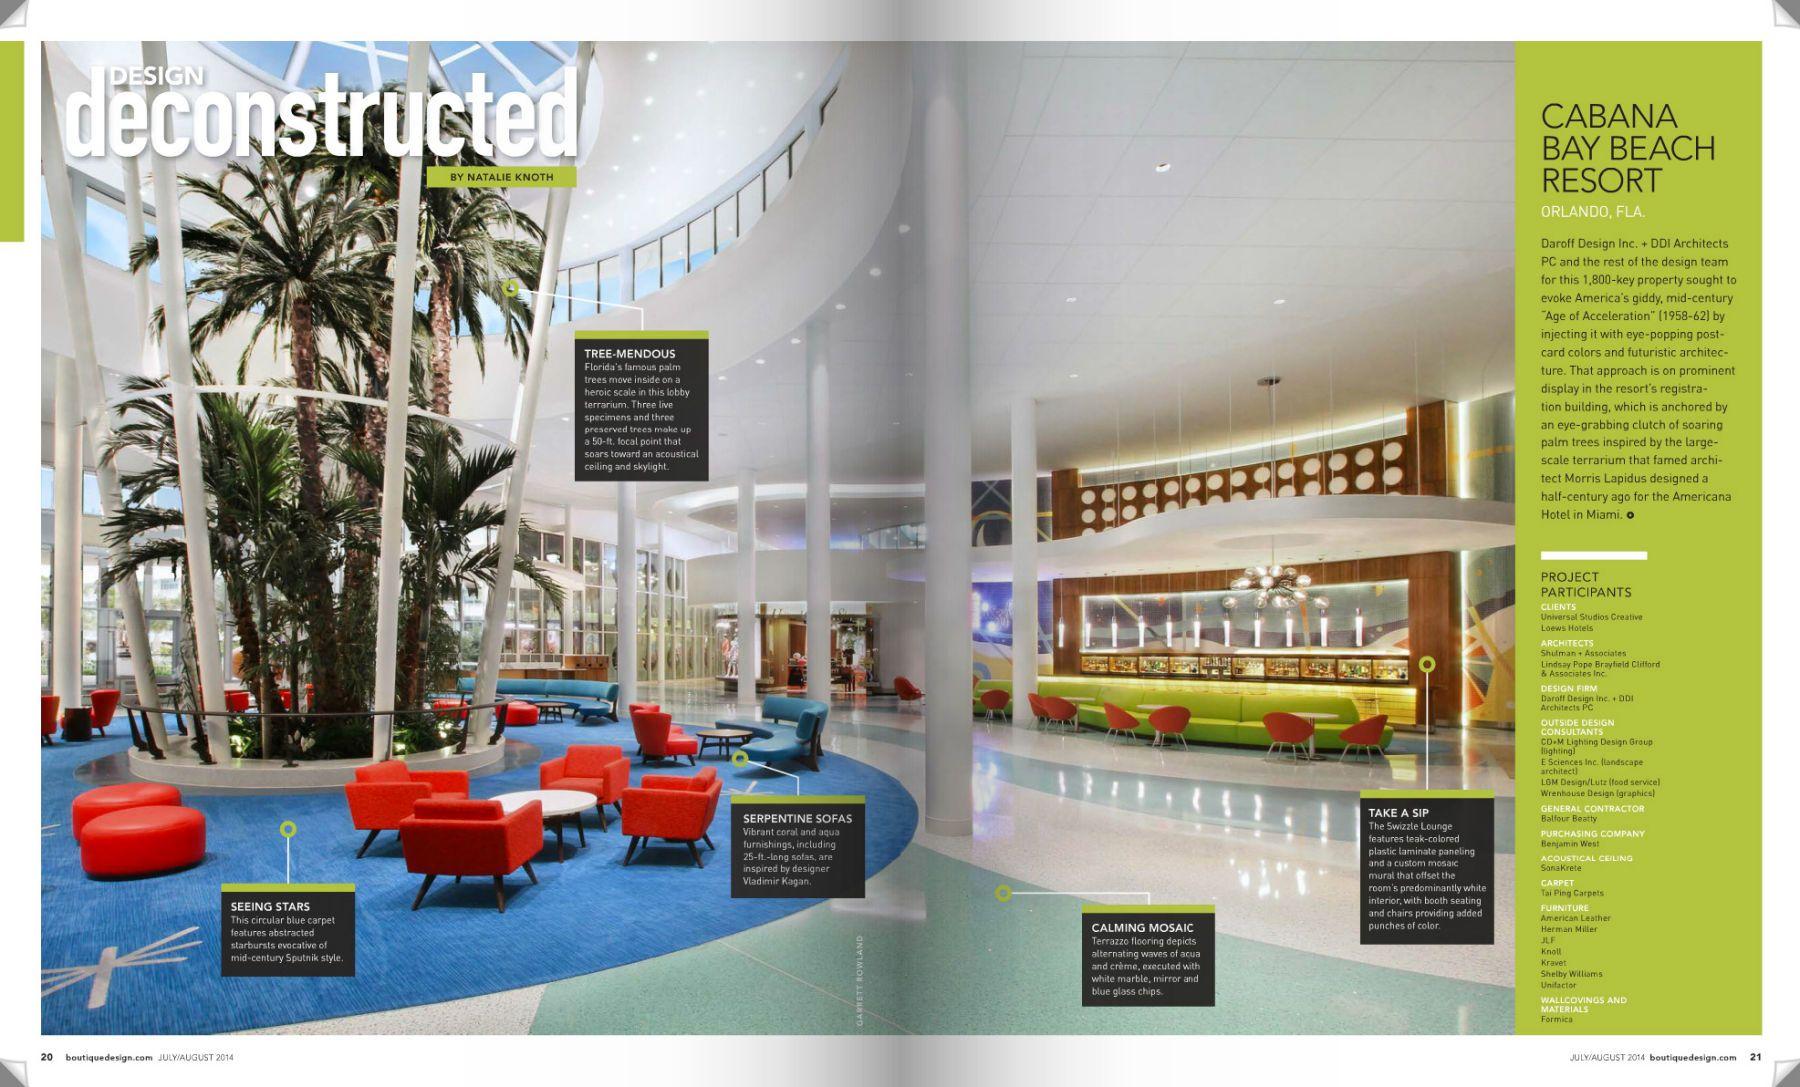 Cabana Bay Beach Resort/Daroff Designs Inc